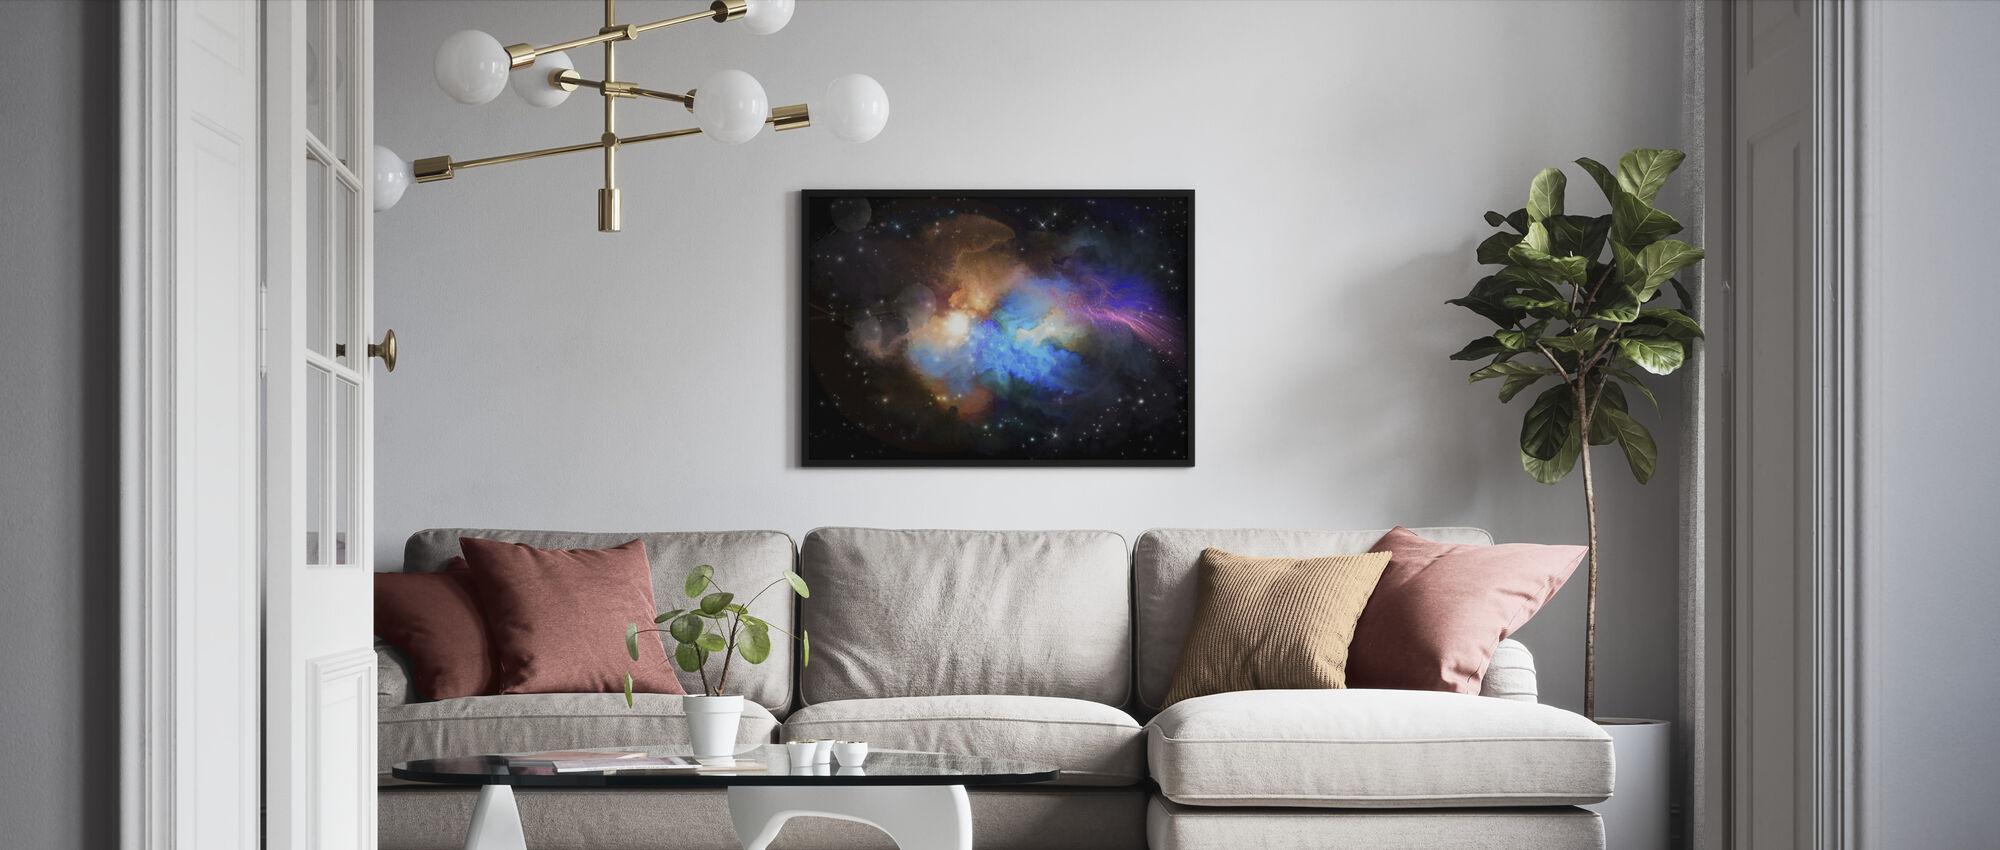 Multicolored Nebula - Framed print - Living Room